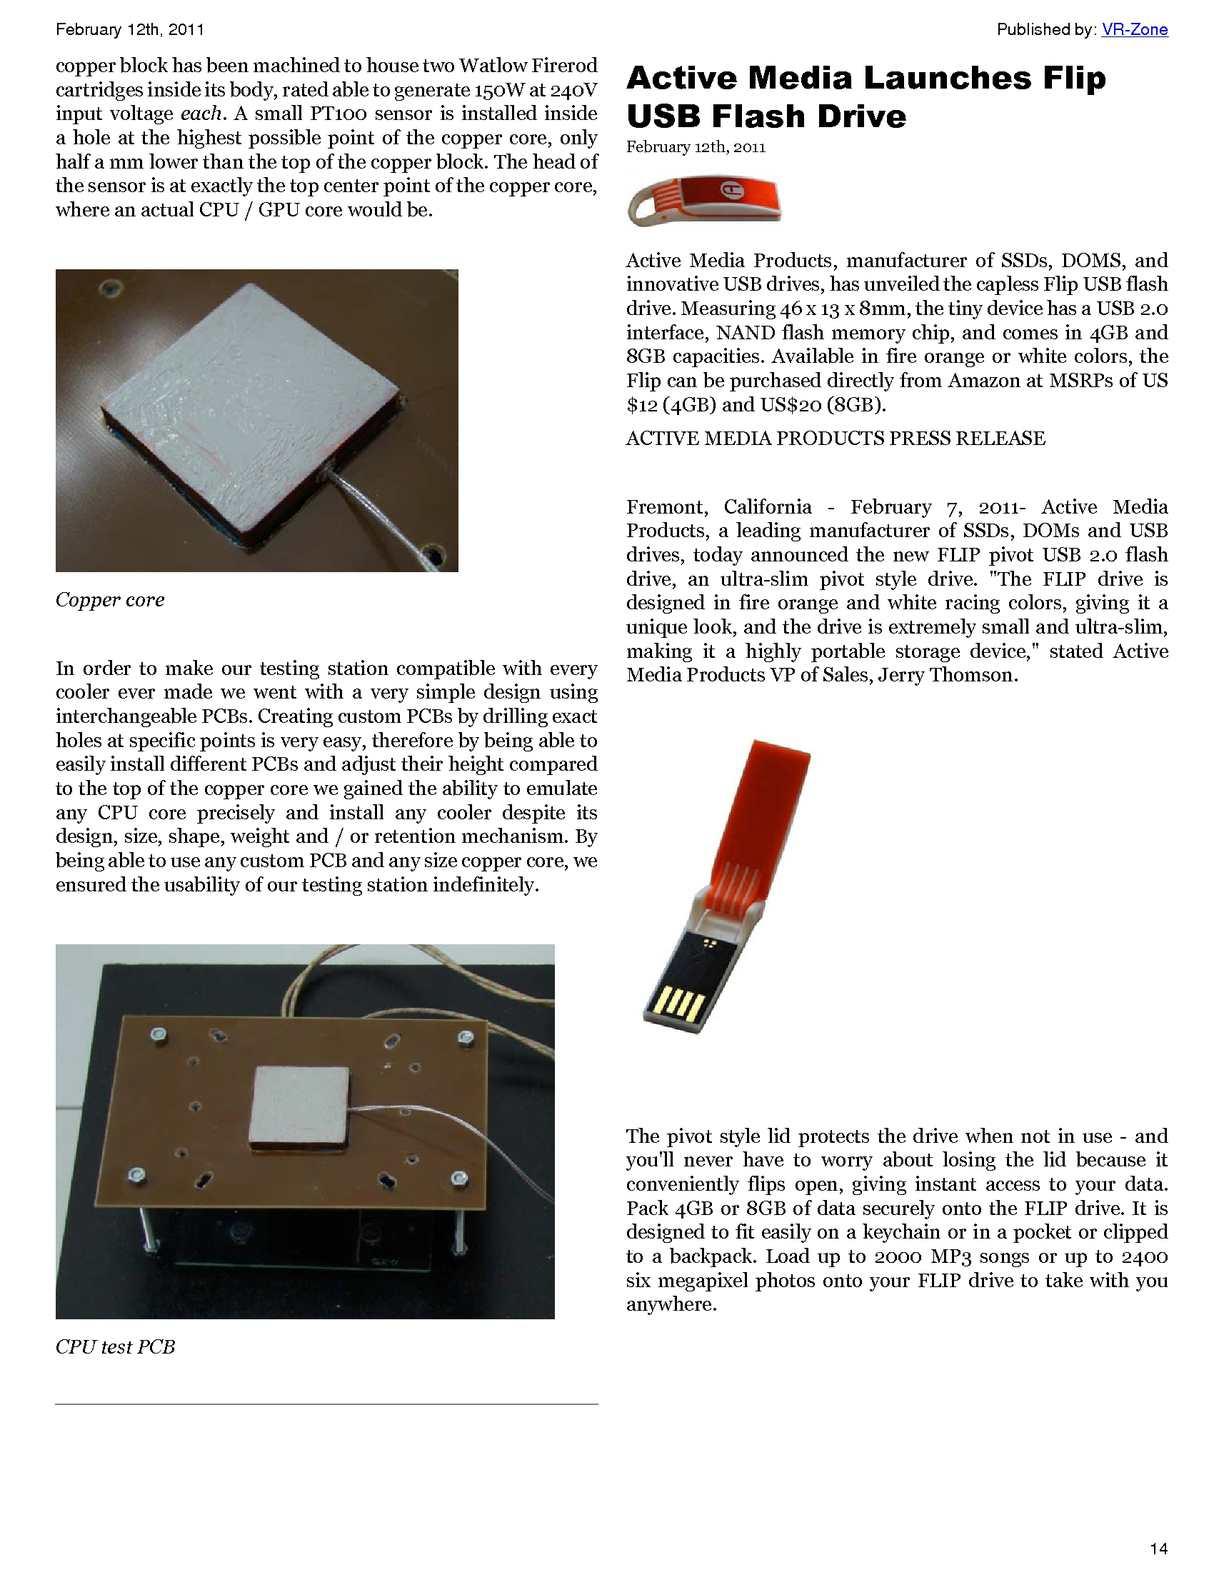 Calamo Vr Zone Technology News Stuff For The Geeks Feb 2011 Issue Samsung Ssd 750 Evo Sata3 500gb 25inch Free Mounting Bracket